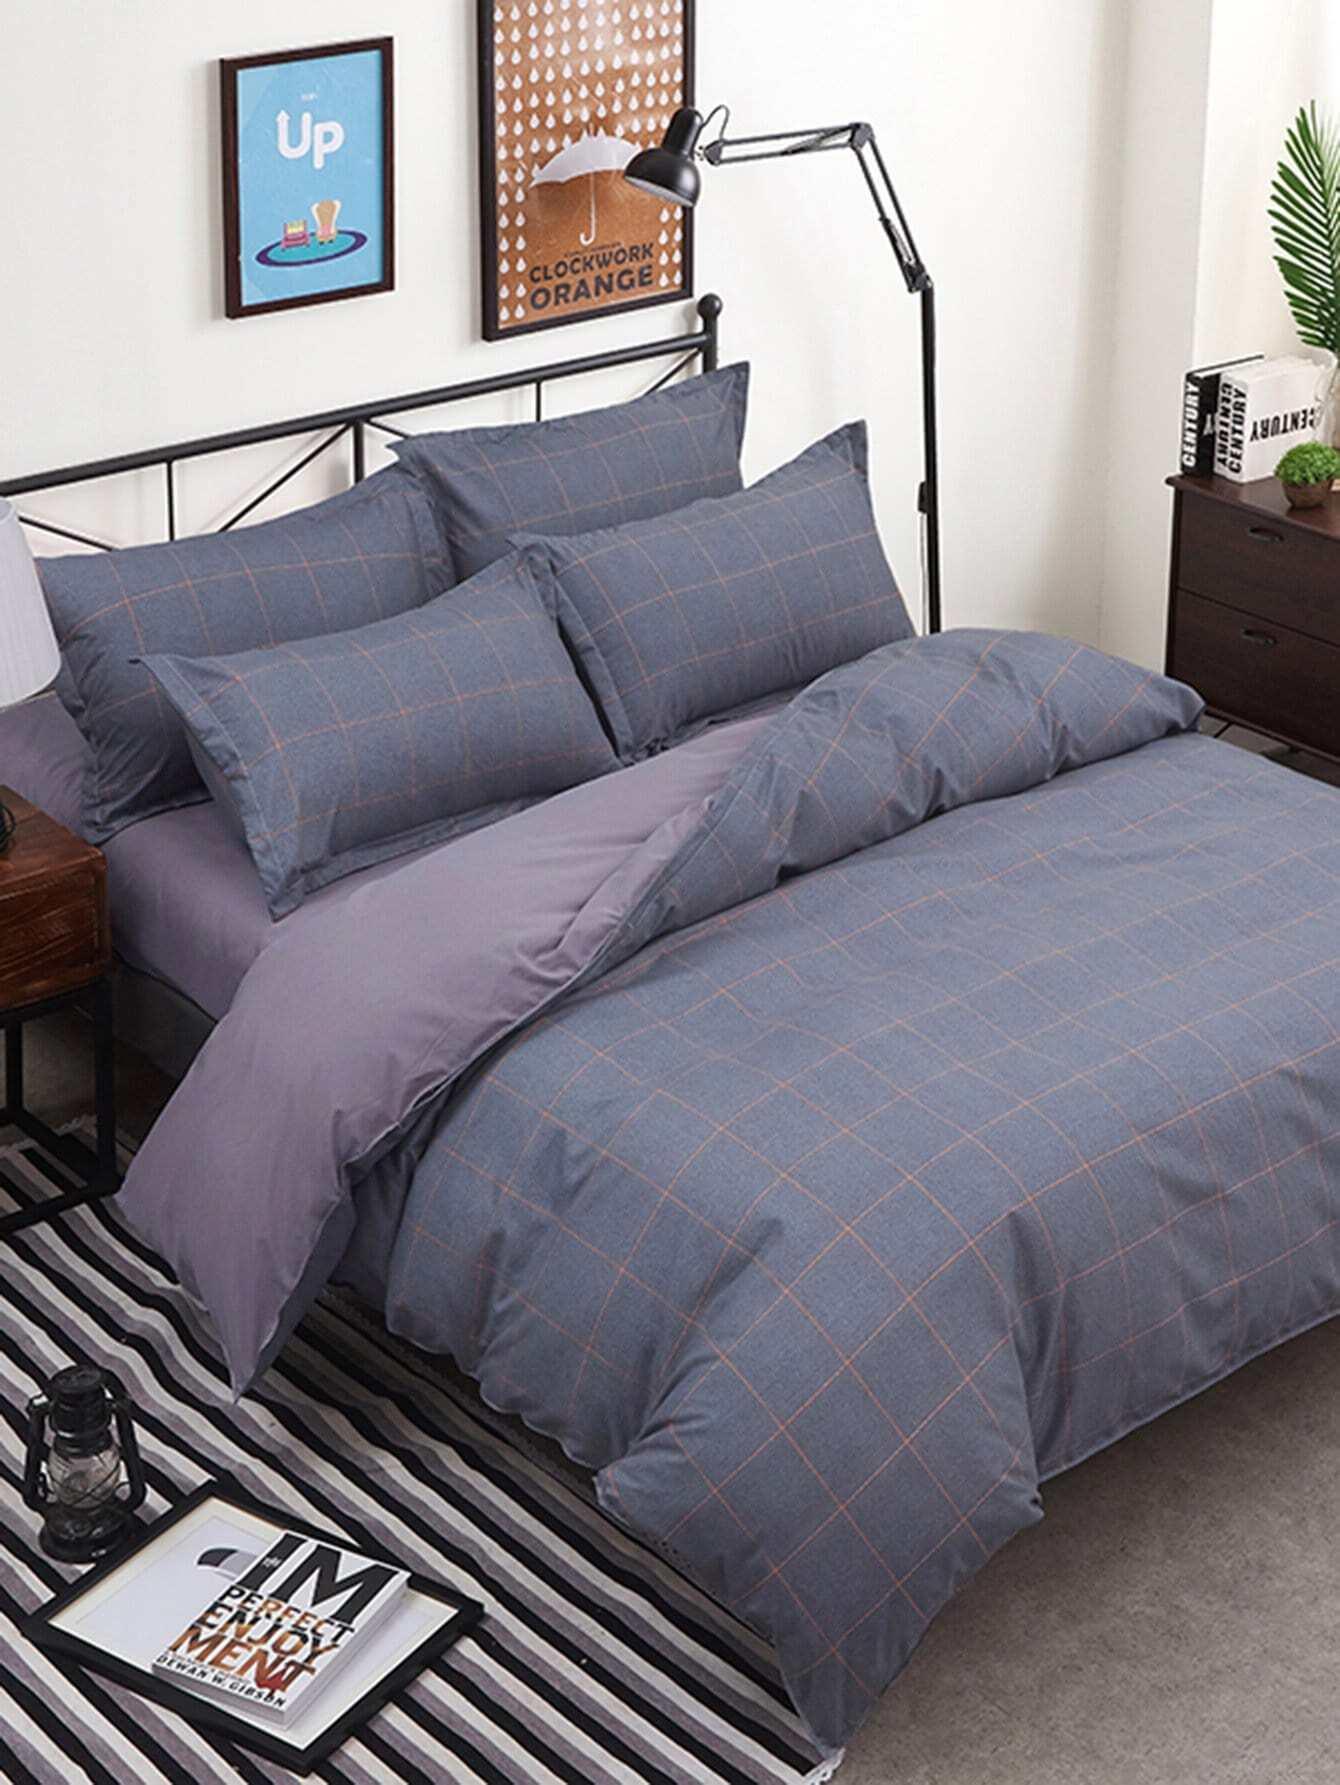 Grid Minimalist Duvet Cover Set striped minimalist duvet cover set